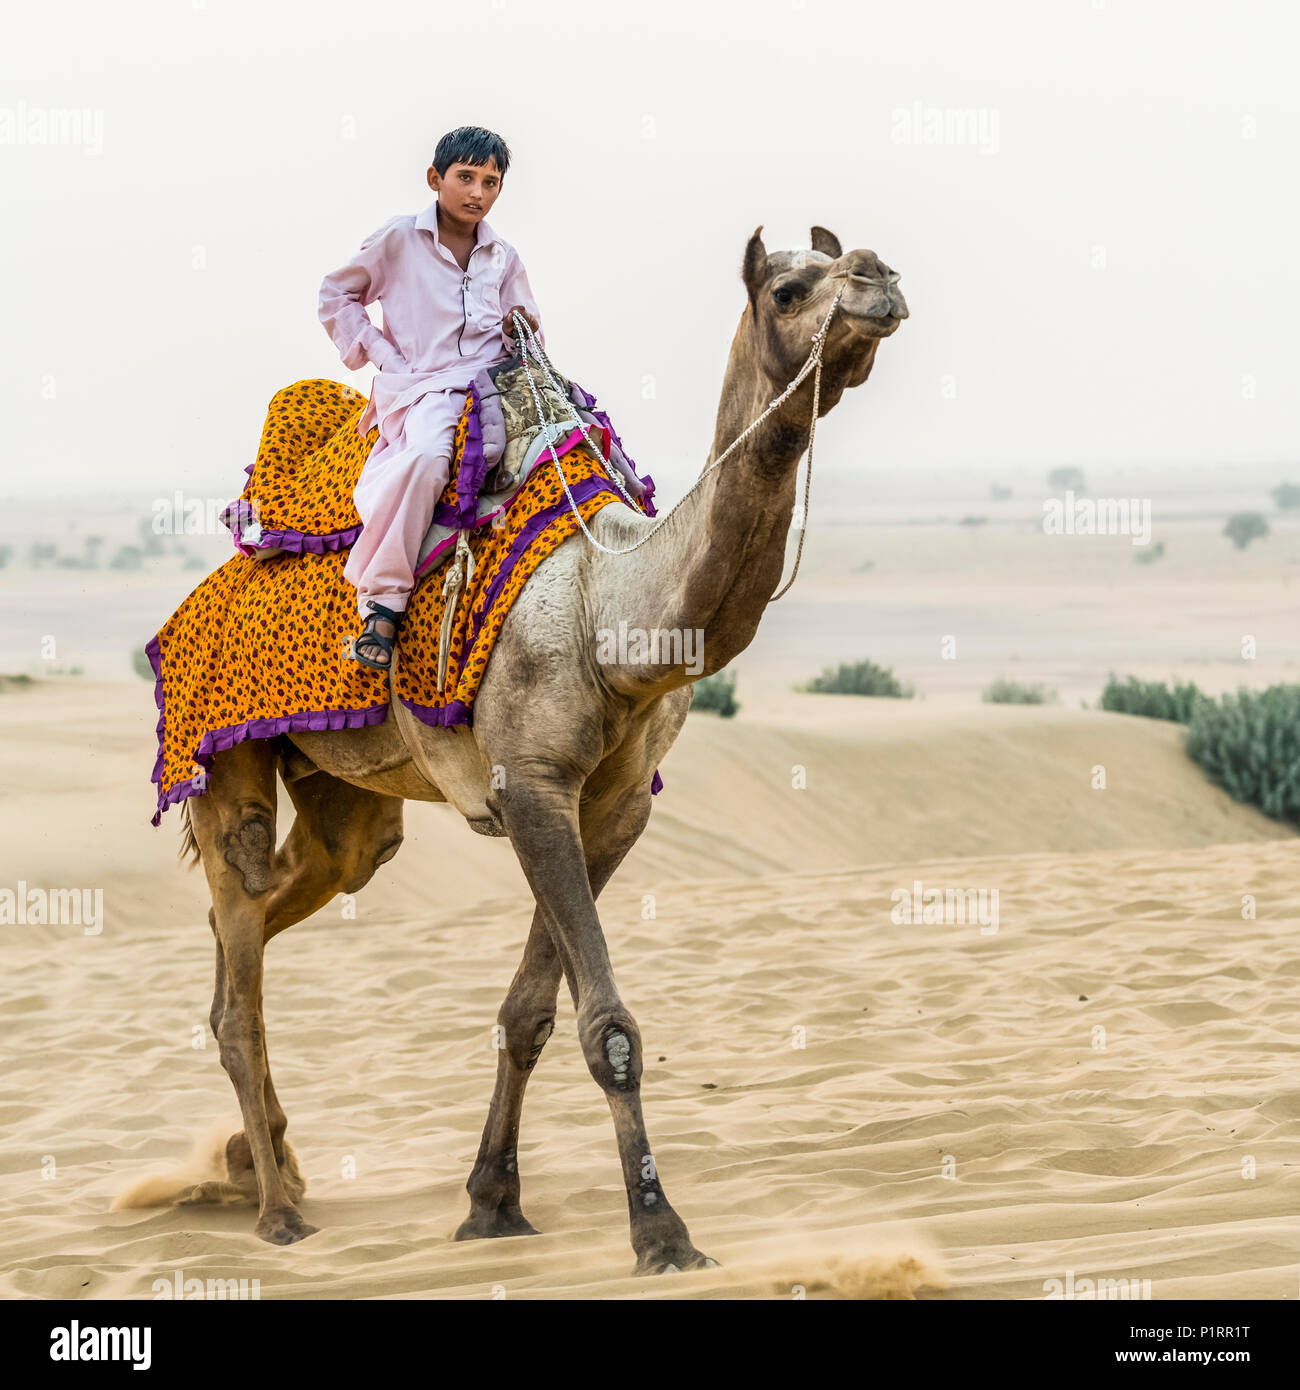 A boy on a camel safari; Damodara, Rajasthan, India - Stock Image